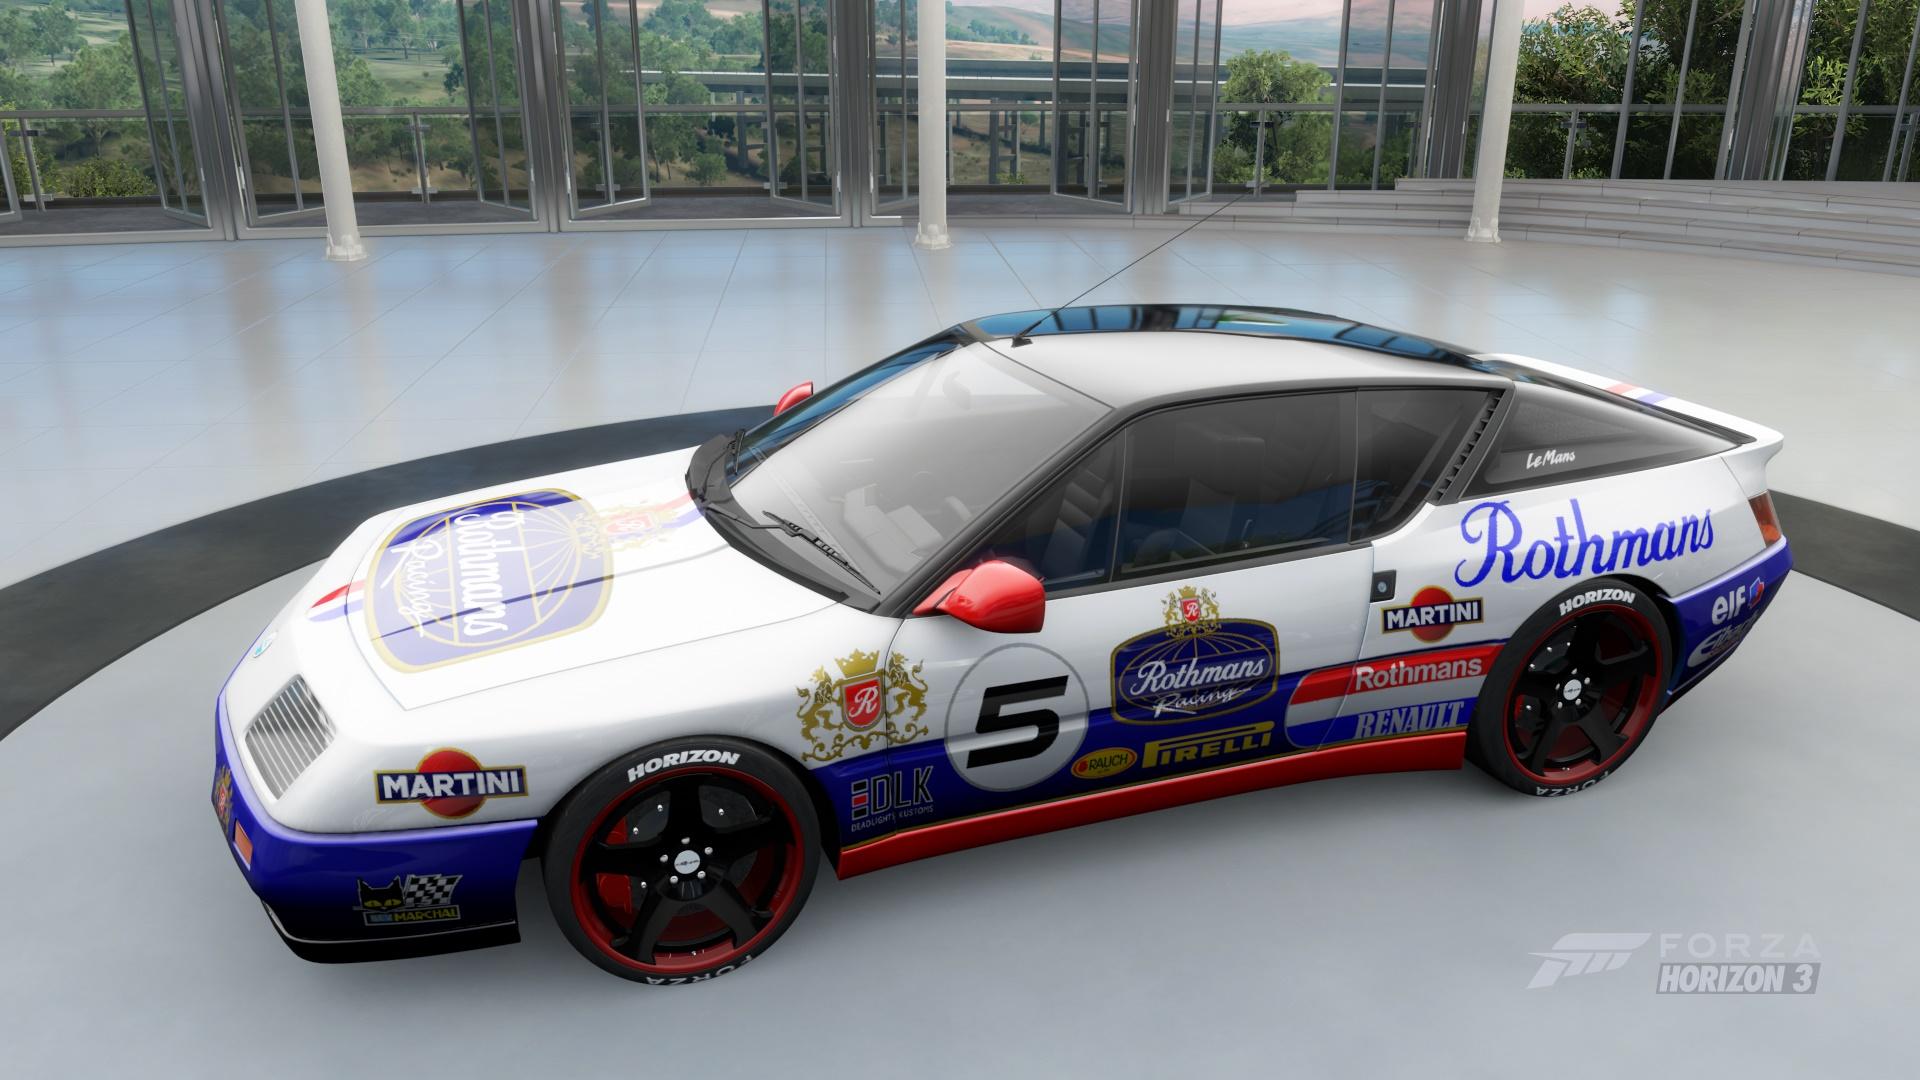 Dlk race fantasy originals ryno workx garage nfl for Renault orleans garage